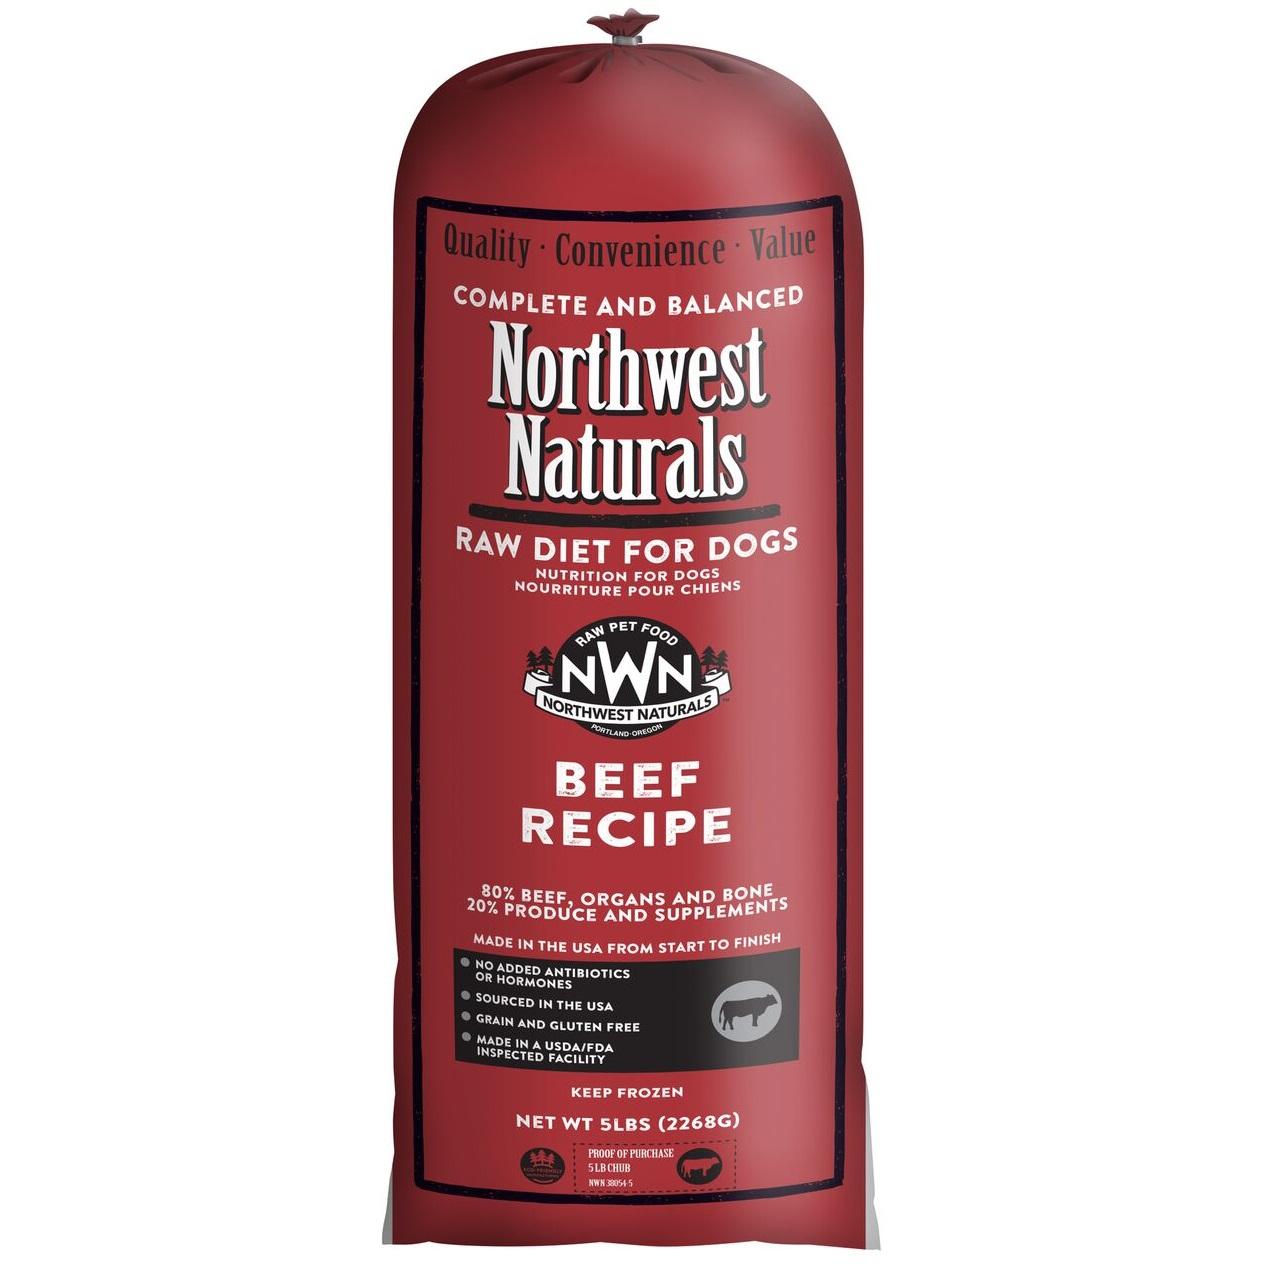 Northwest Naturals Raw Diet Grain-Free Beef Chub Roll Raw Frozen Dog Food 5lbs